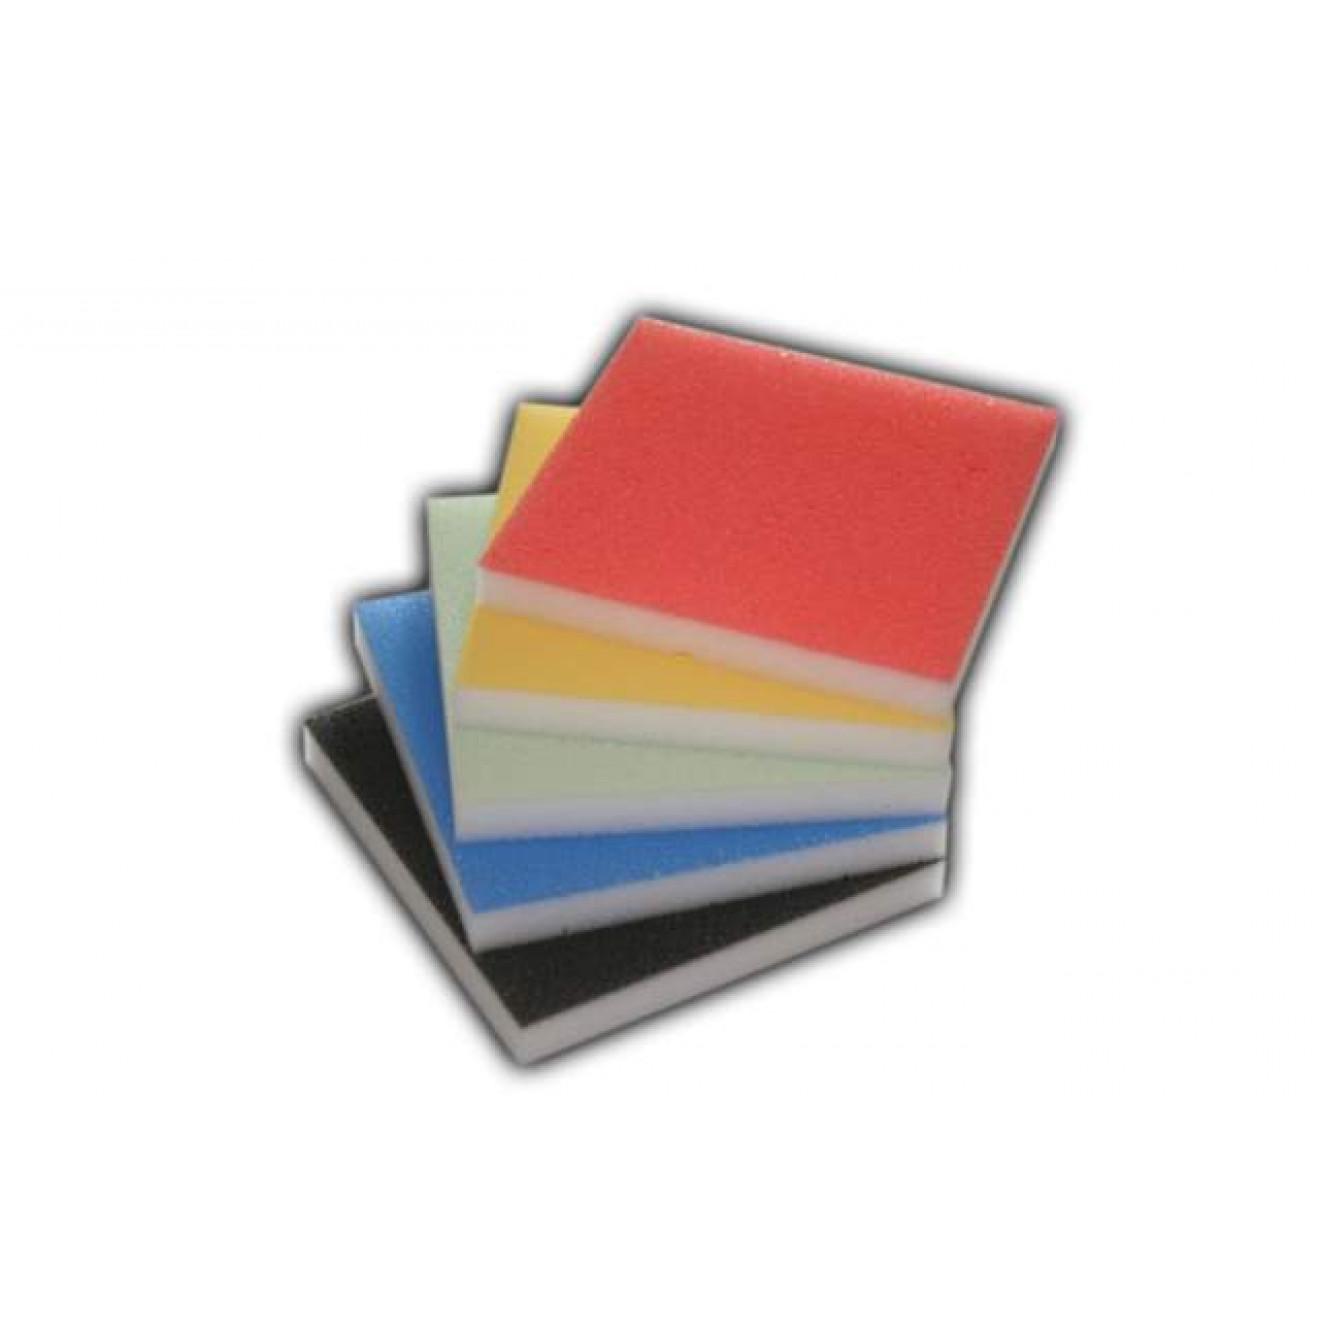 Matratzen farbig  Basotect farbig